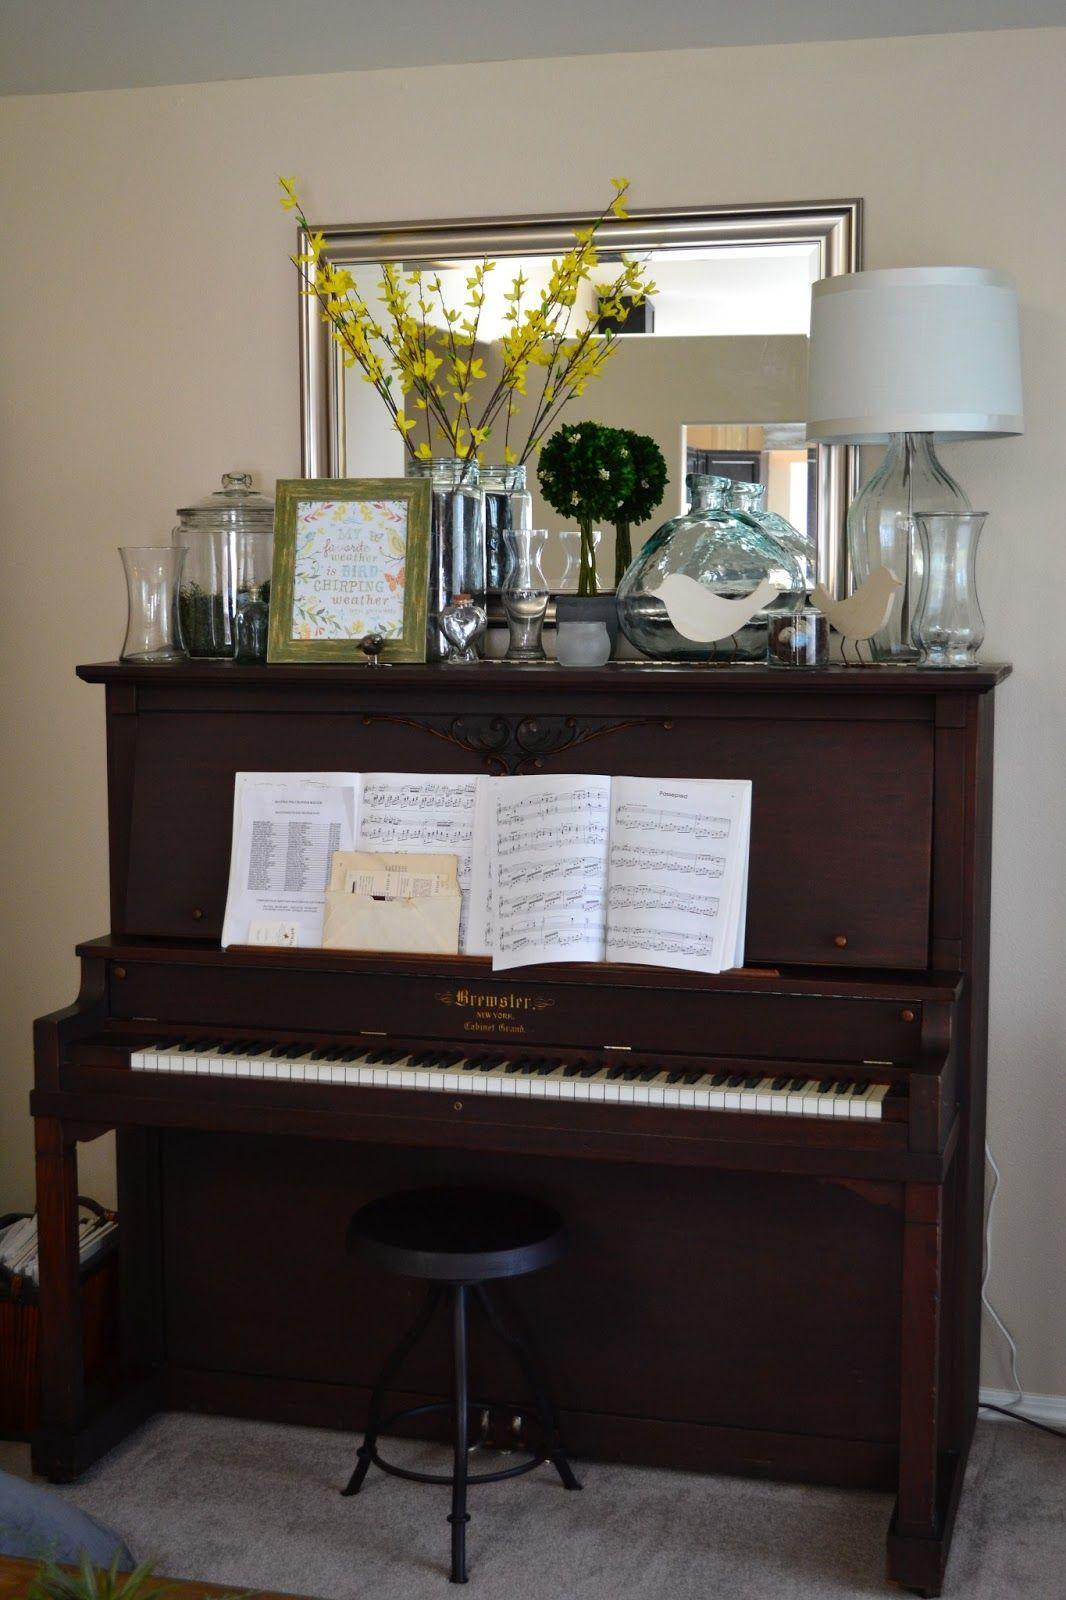 Spring Is For The Birds Piano Decor Piano Room Decor Piano